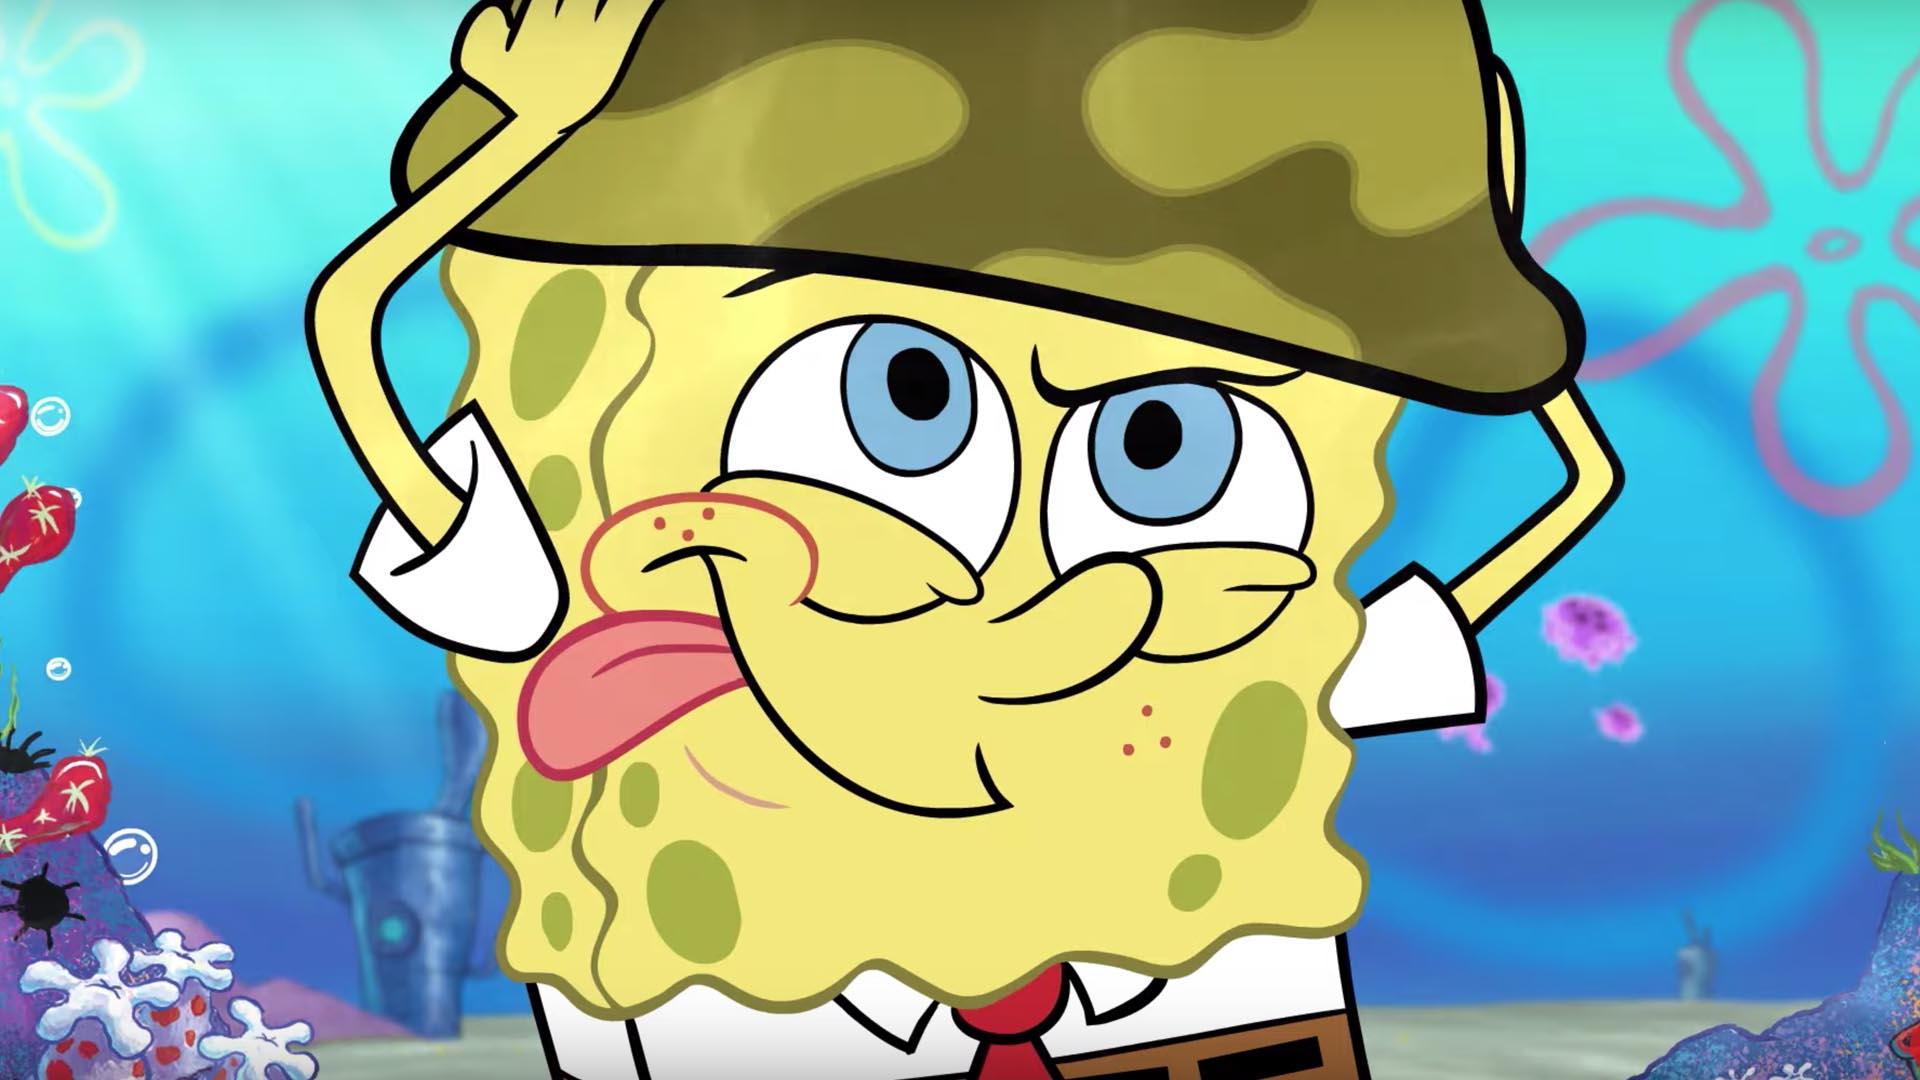 Oznámena hra SpongeBob SquarePants: Battle for Bikini Bottom – Rehydrated